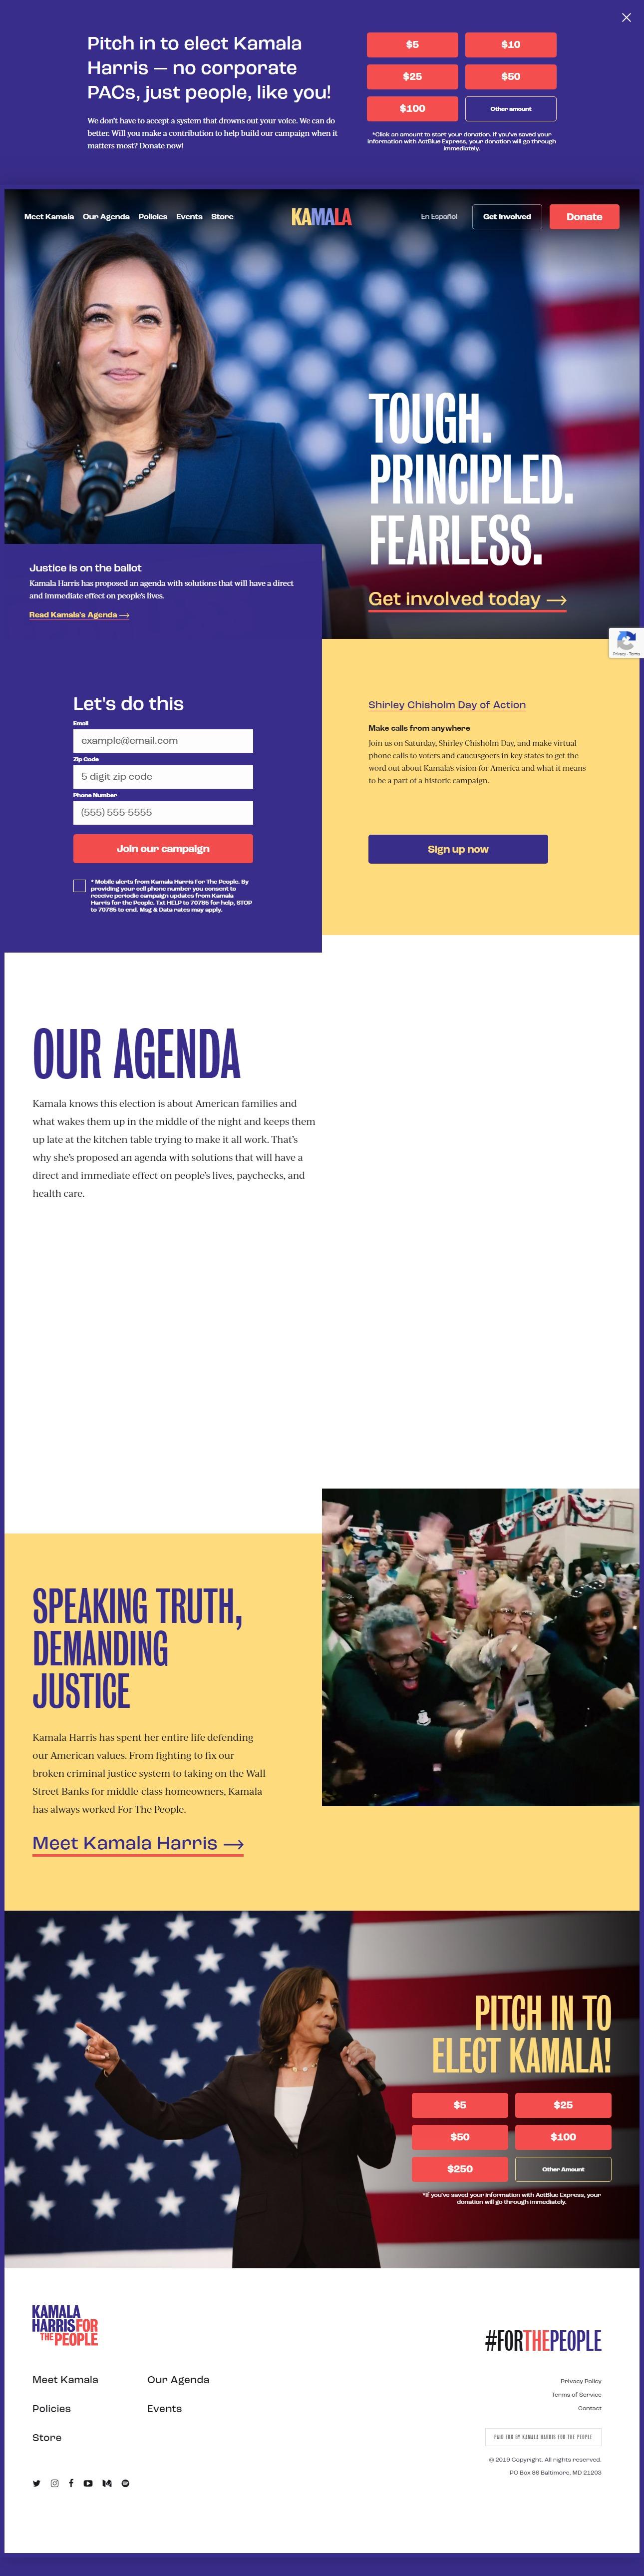 Homepage Snapshot for December 1, 2019: Senator Kamala Harris